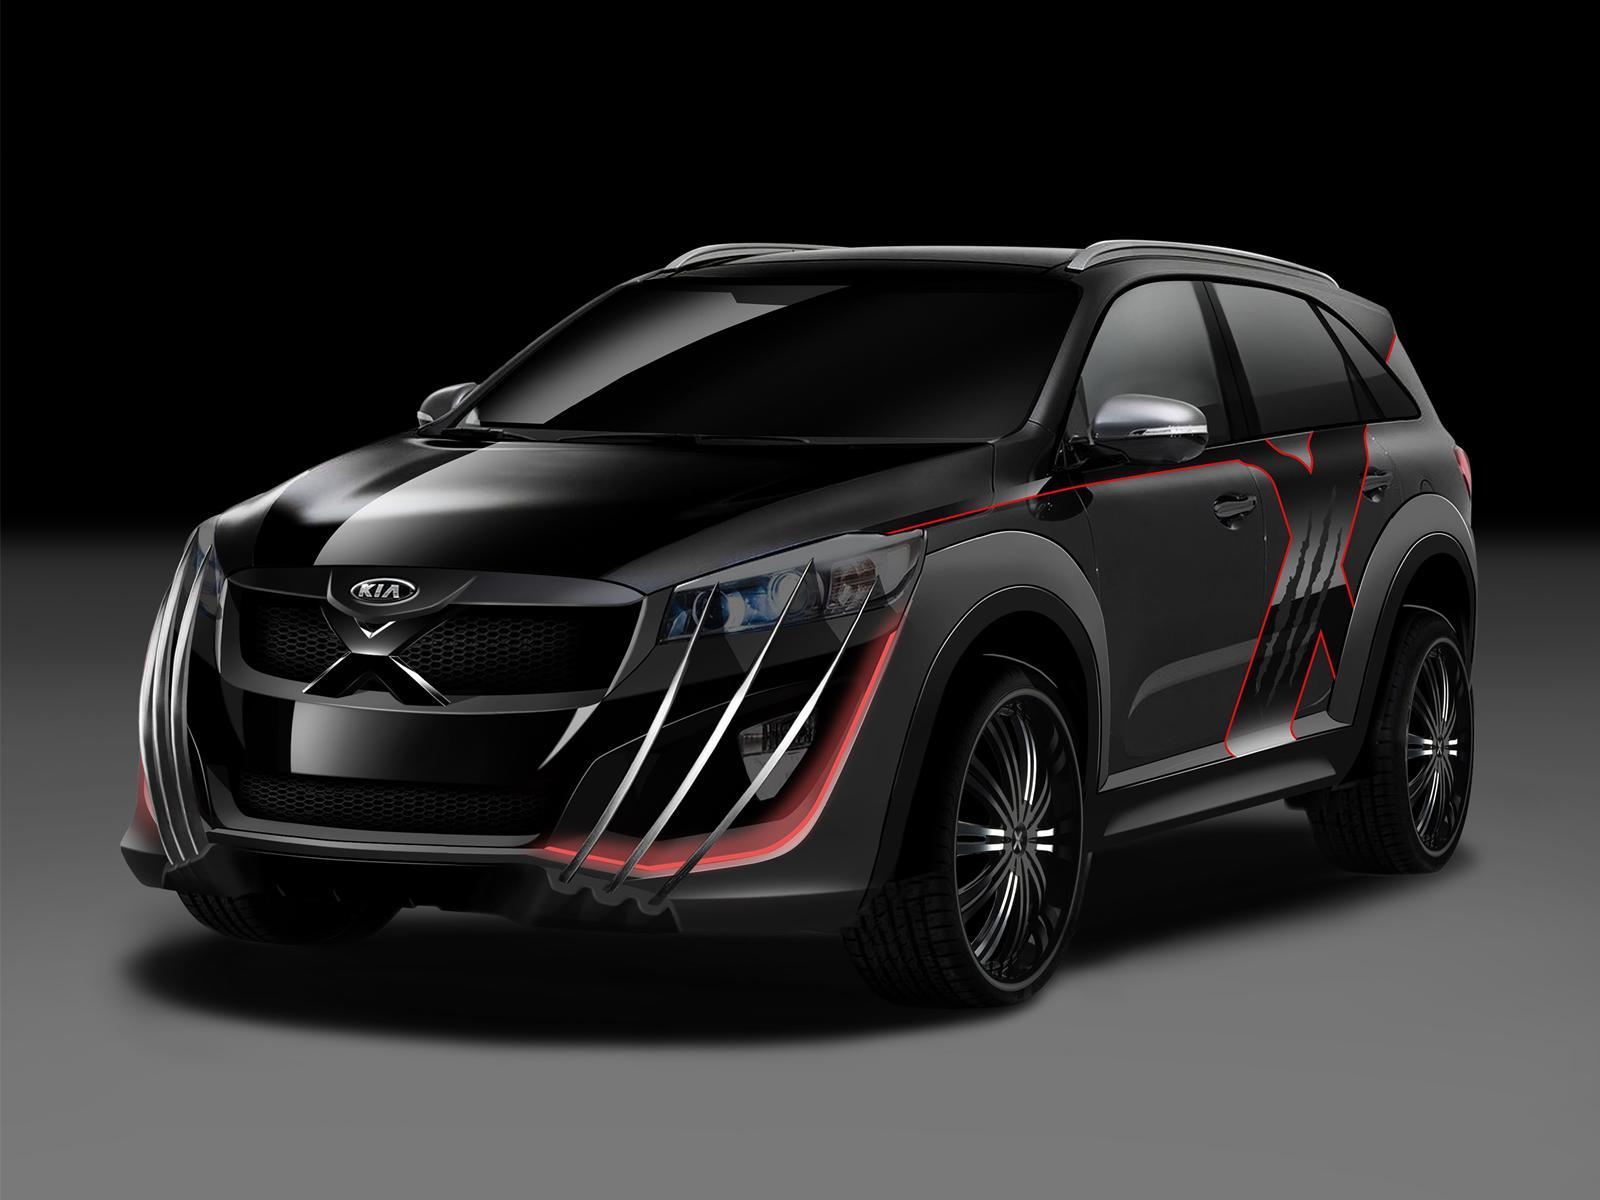 Kia Cyborg Car